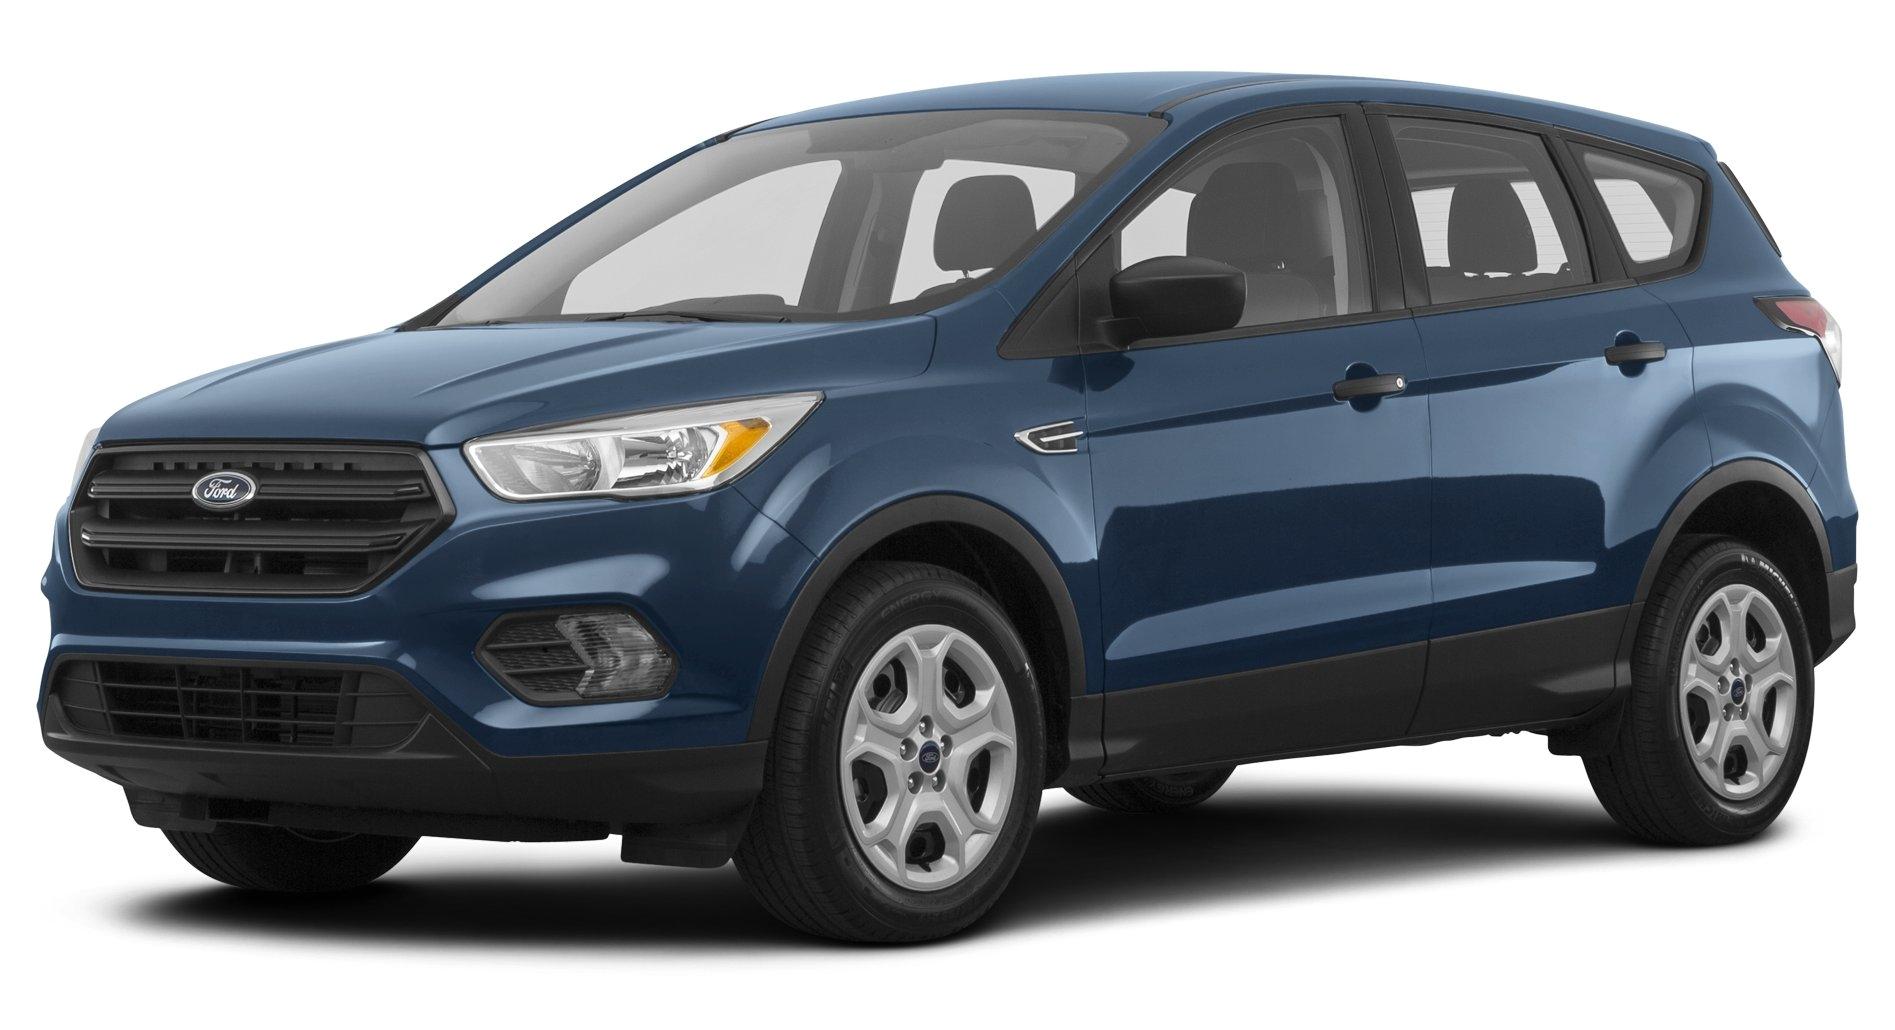 2013 ford Escape Floor Mats Amazon Amazon Com 2018 ford Escape Reviews Images and Specs Vehicles